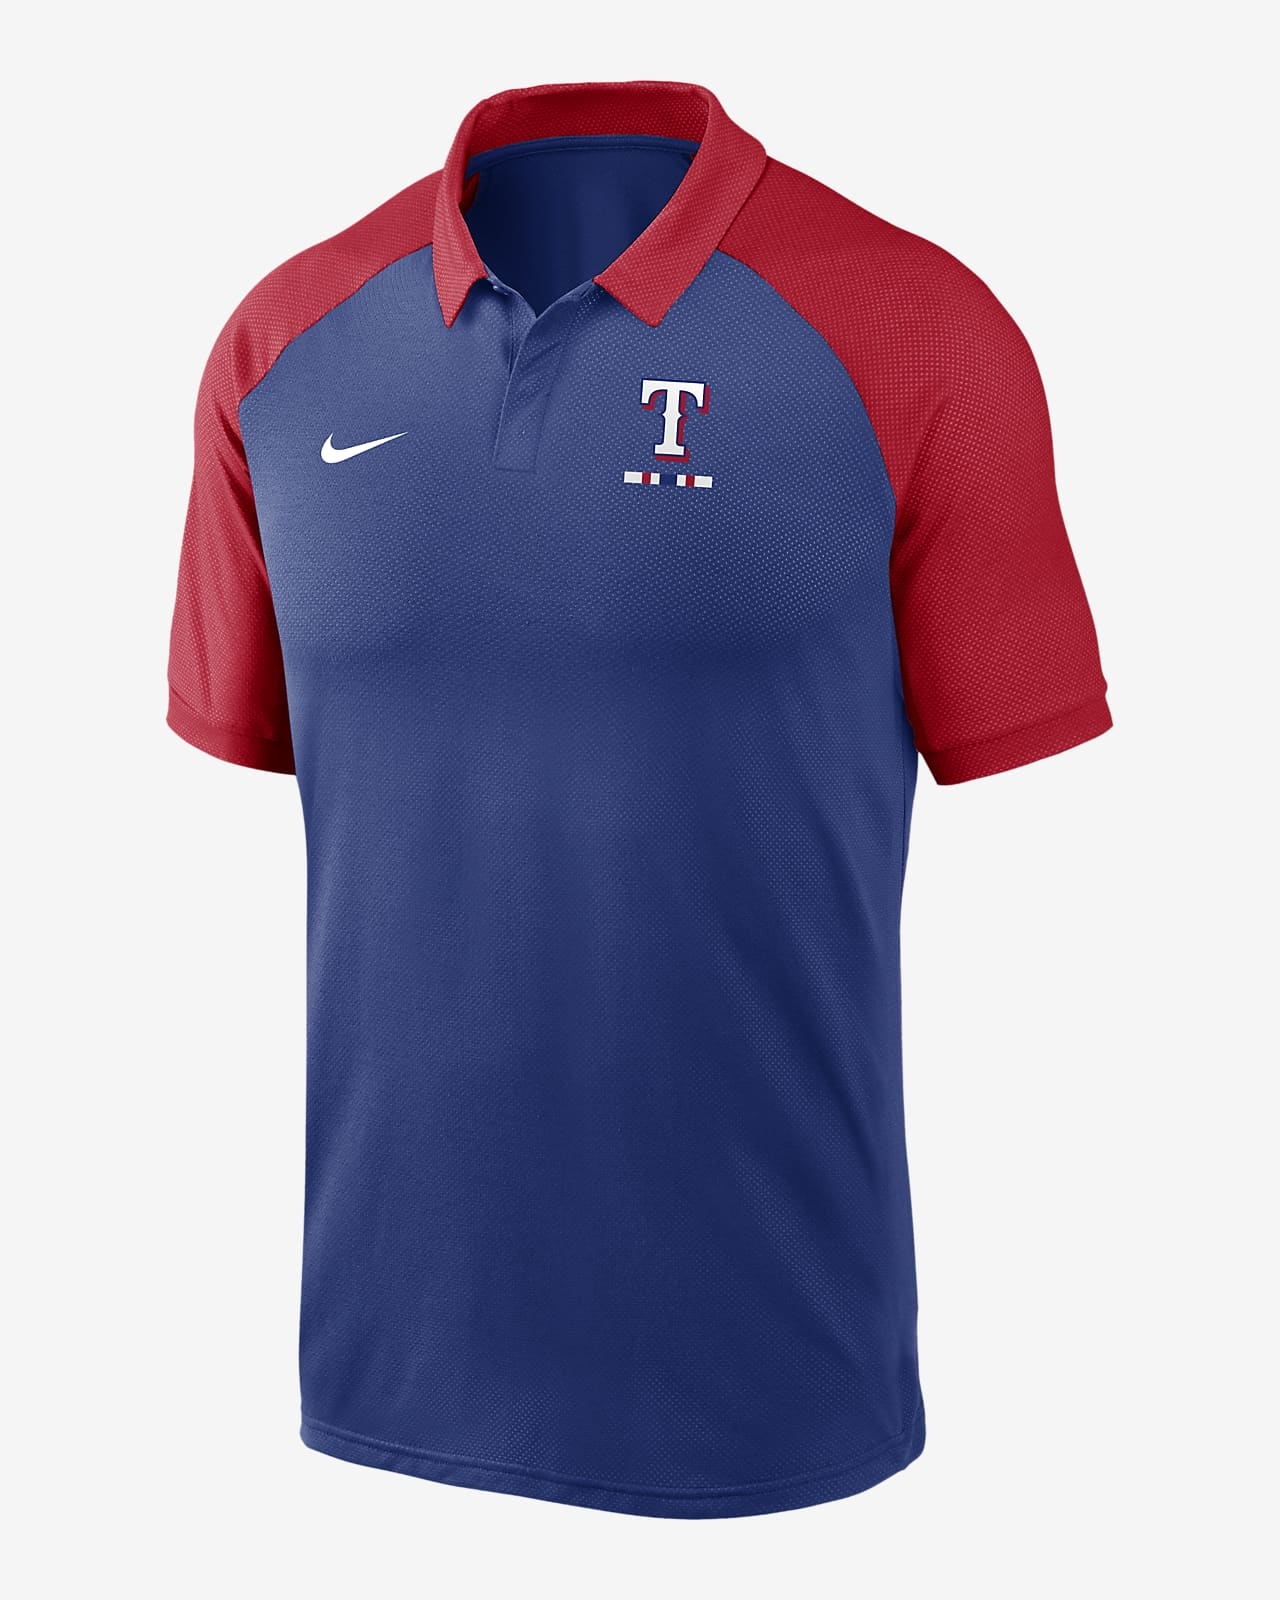 Nike Dri-FIT Legacy (MLB Texas Rangers) Men's Polo